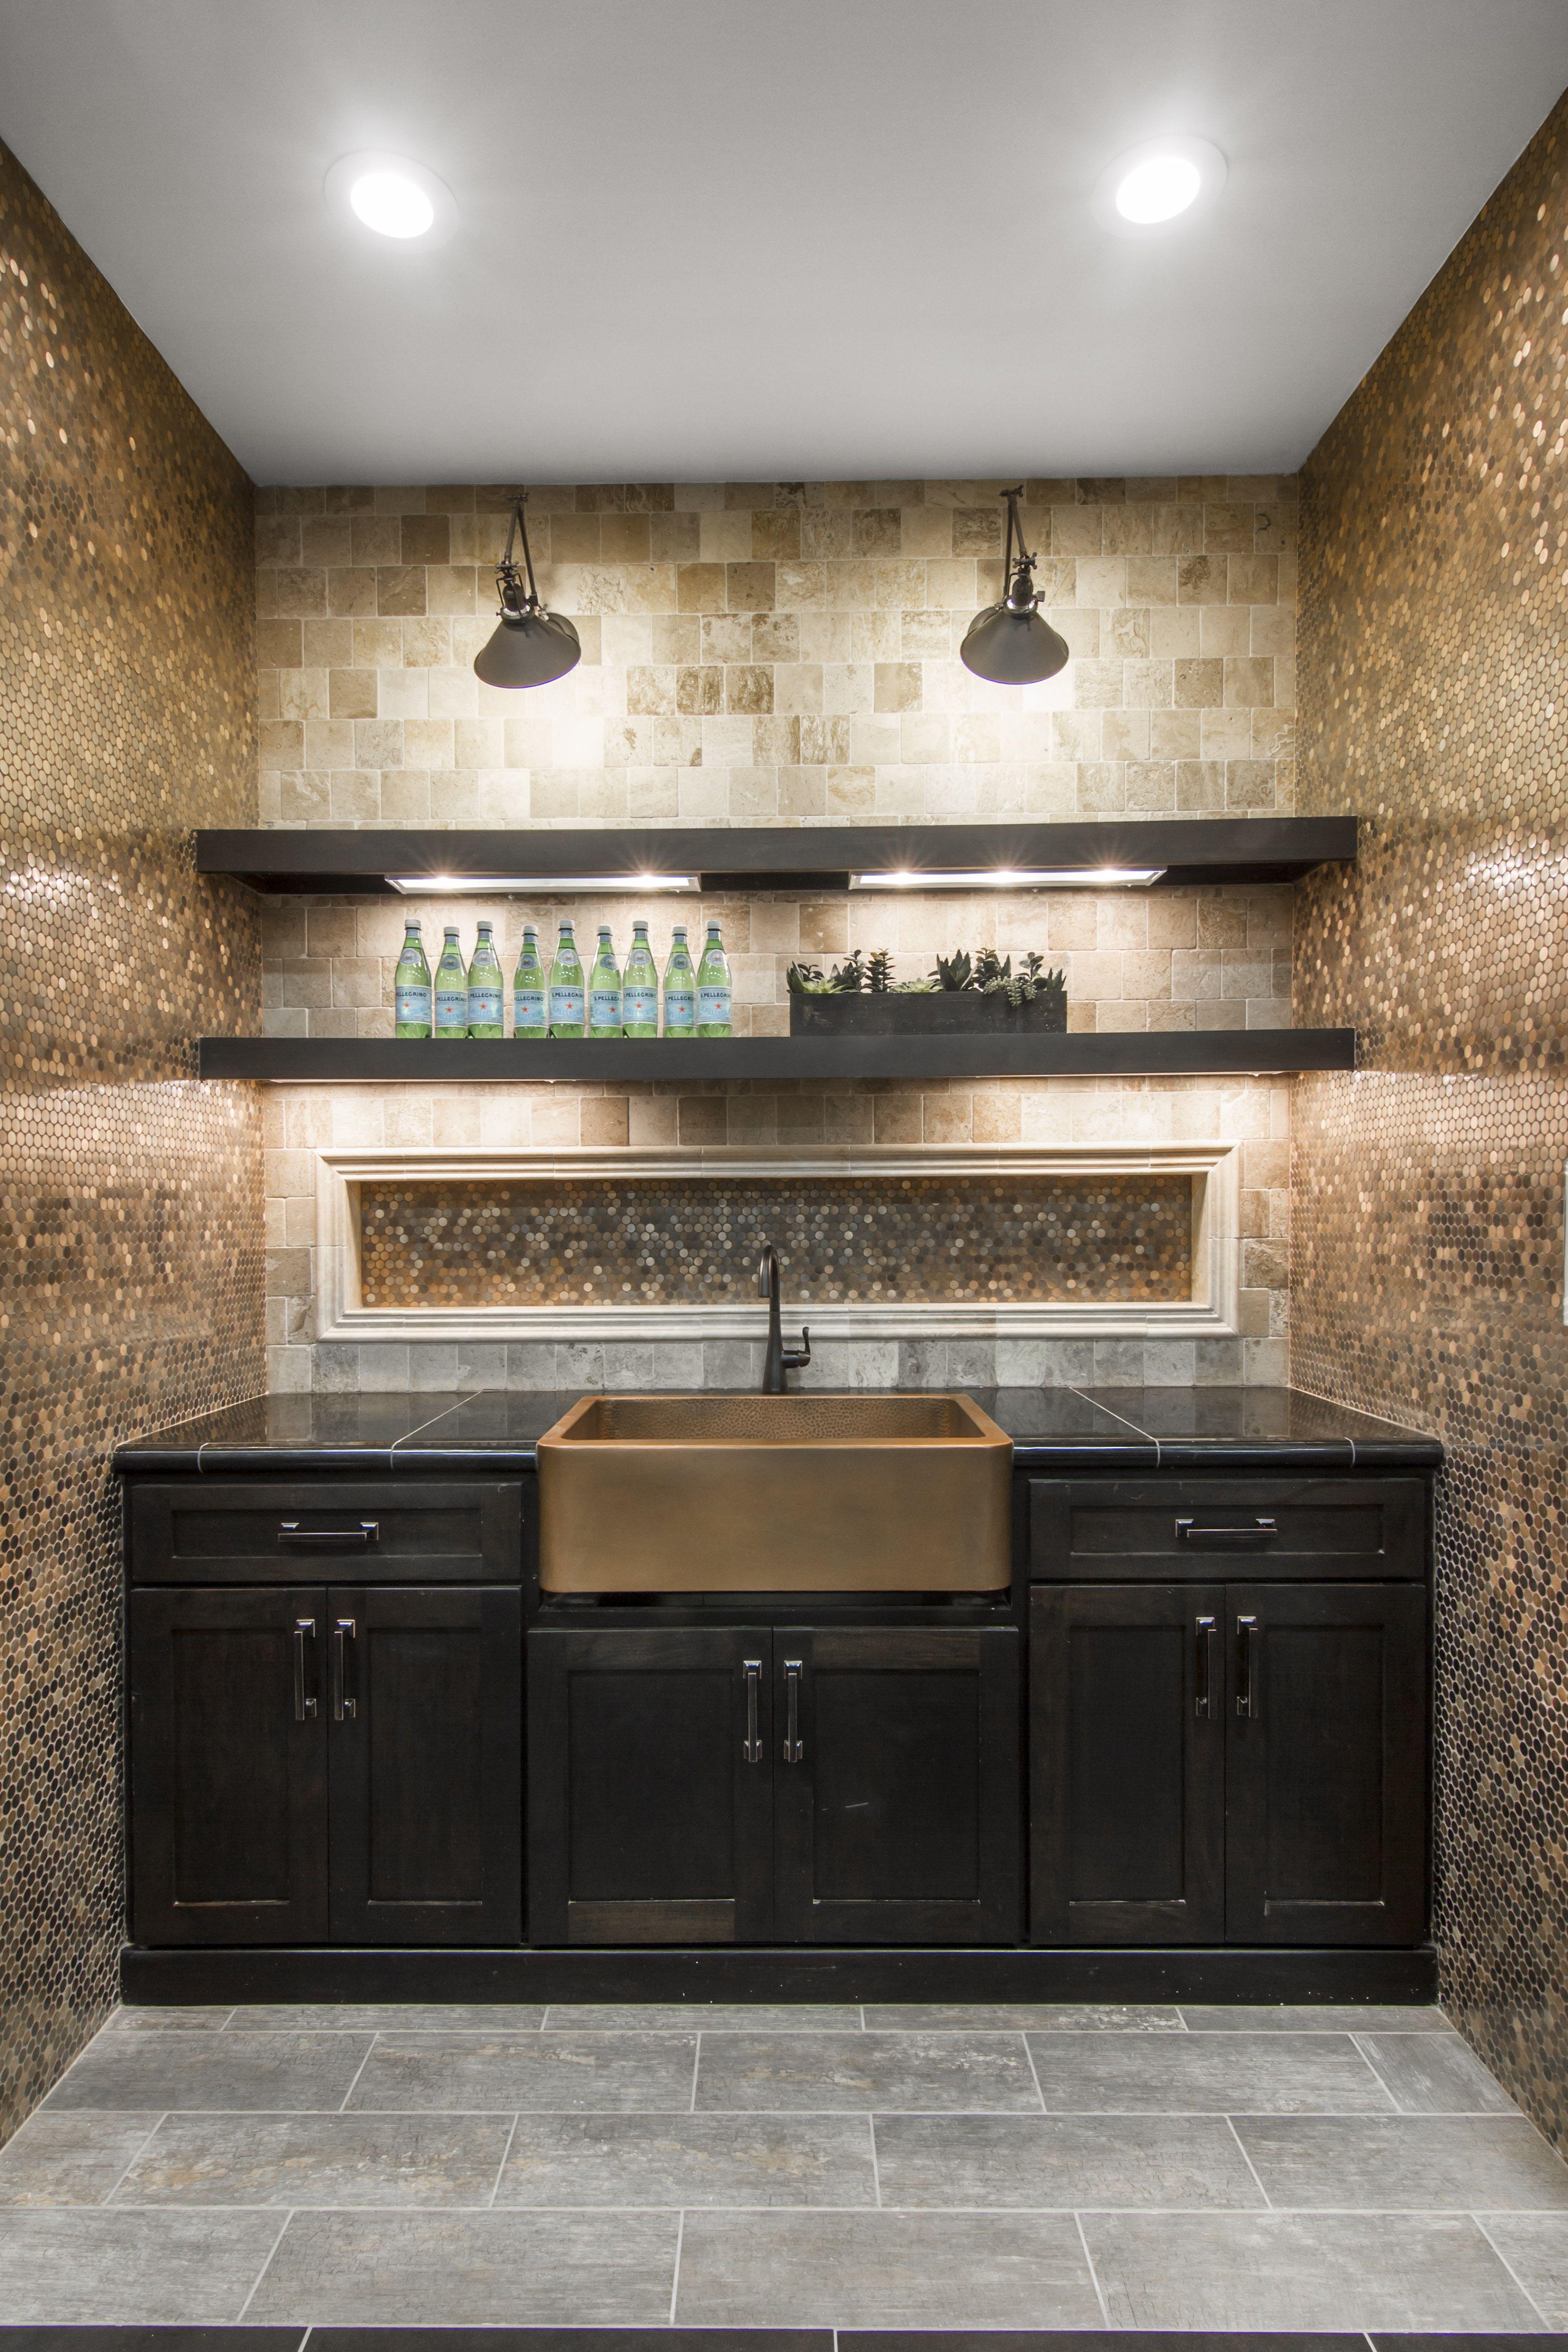 Copper Penny Round Mosaic Tile Backsplash And A Copper Farm Sink